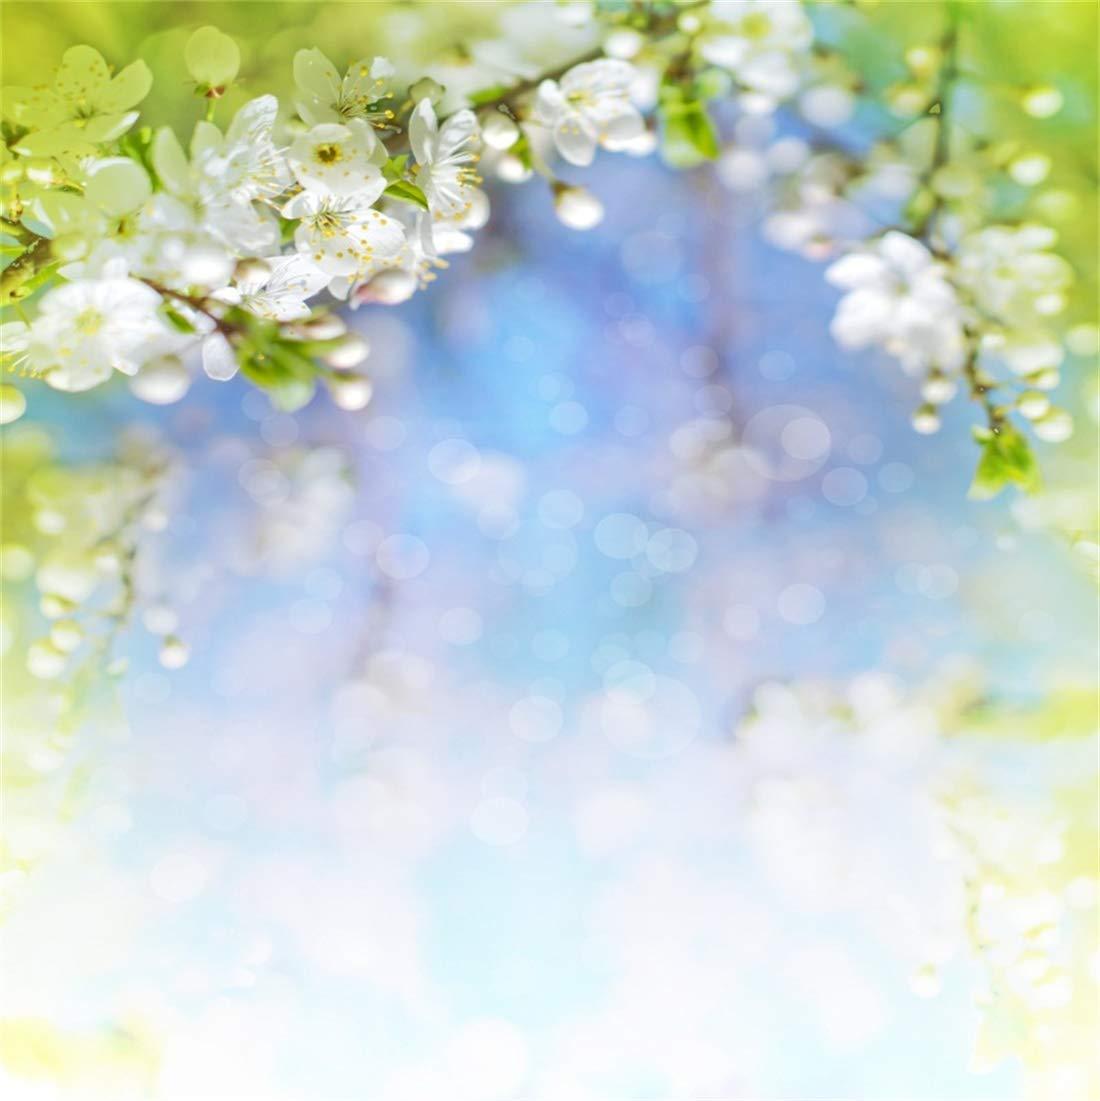 Yeele 6x6フィート ビニール 写真 背景 春の風景 桜 花 枝 ぼかしの焦点 白 花 草 太陽の光 写真 背景 写真 スタジオ 小道具   B07MNSDVM4